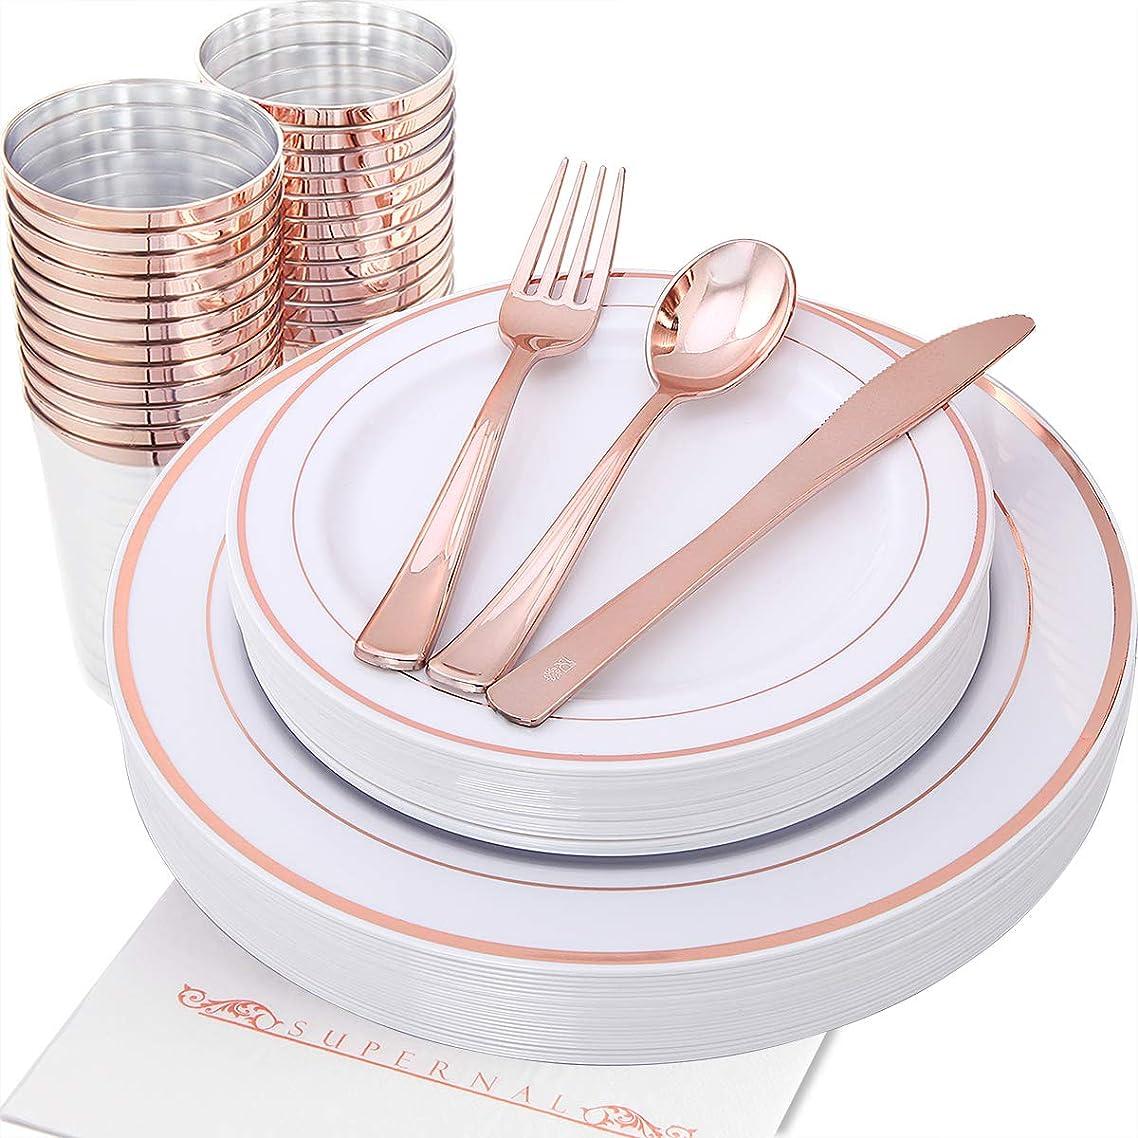 175 PCS Rose Gold Plates, Plastic Dinnerware, Hard Plastic Plates Includes: 25 Rose Gold Dinner Plates, 25 Salad Plates, 25 Rose Gold Silverware, 25 Rose Gold Cups, Bonus 25 White Napkins,Supernal